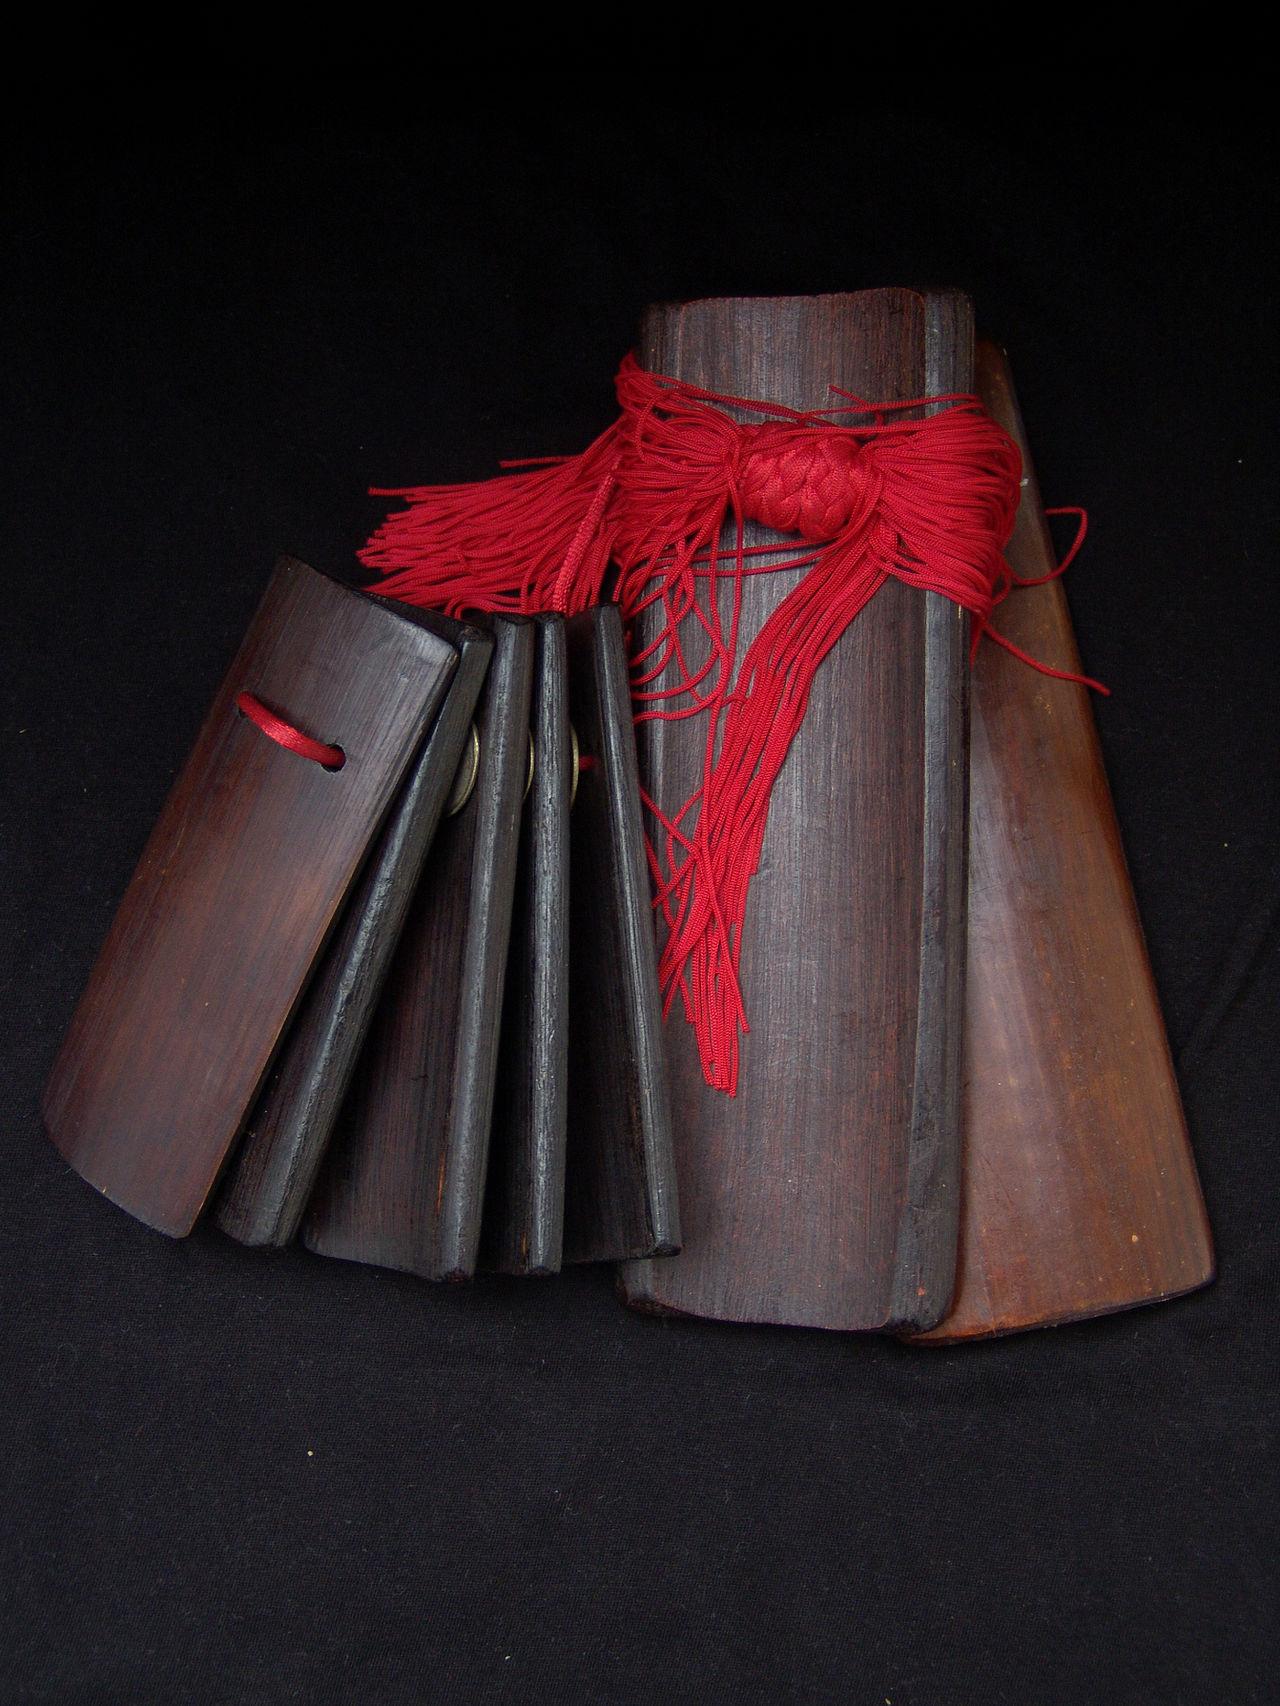 Black Background Celebration Chinese Music Instruments Close-up Day Indoors  Kuaibanr No People Red